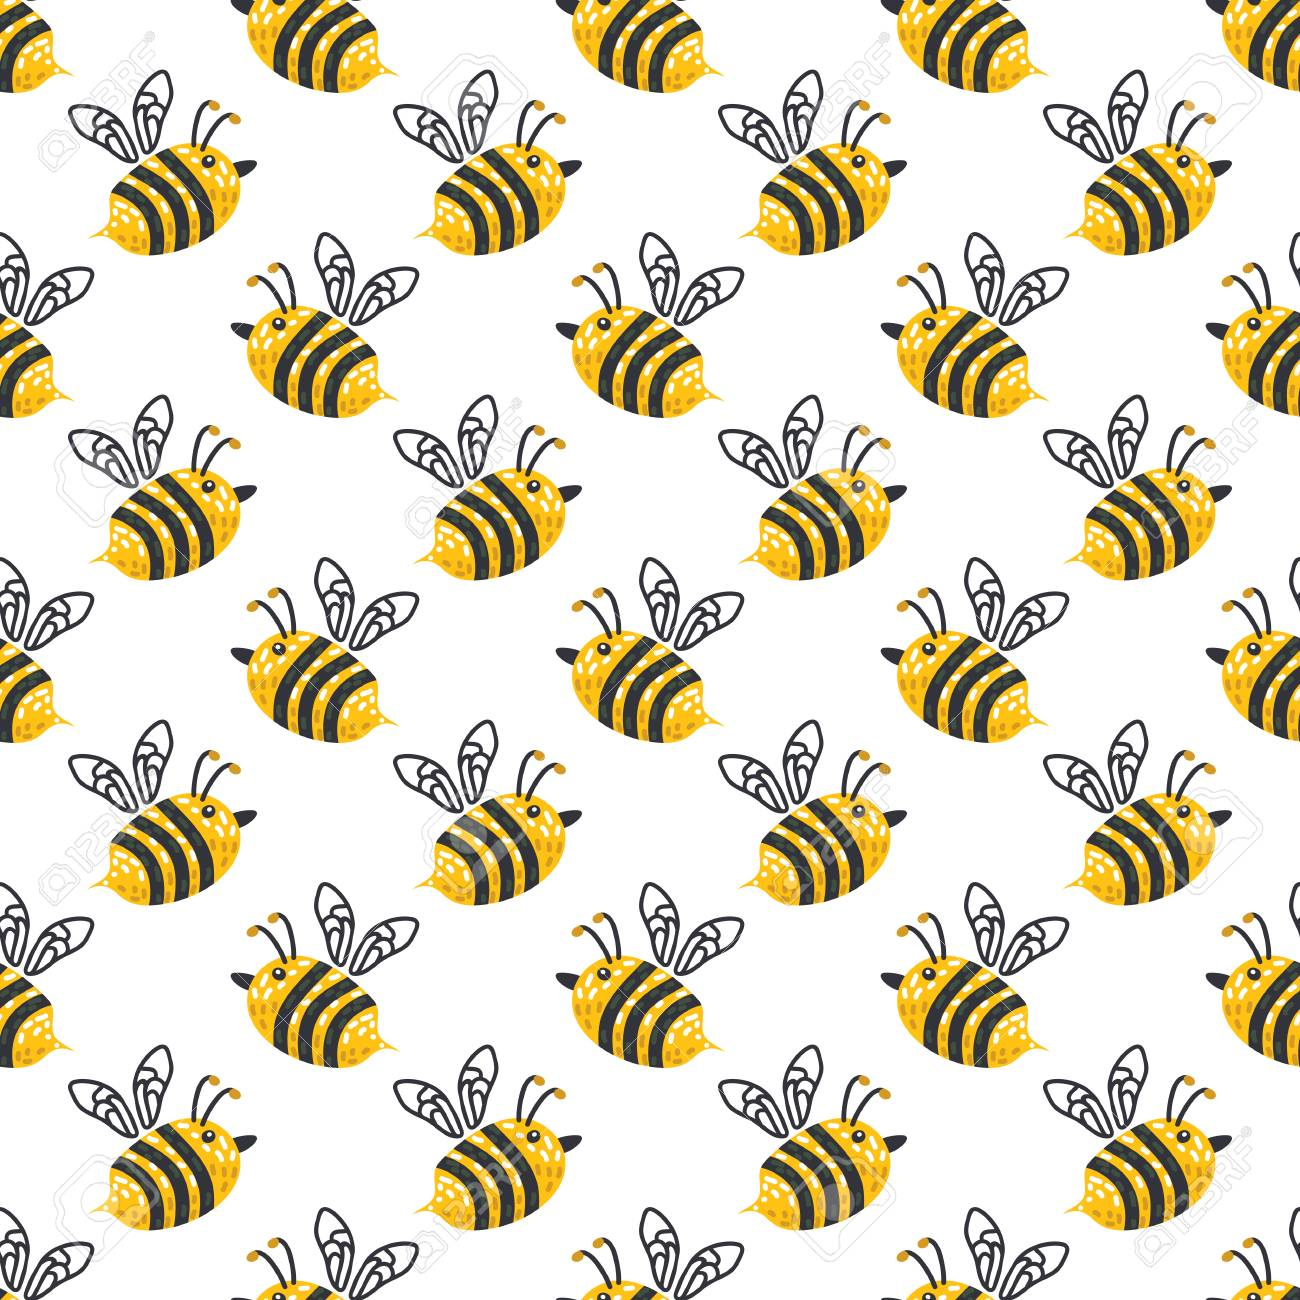 Seamless Pattern With Honeybee Vector Illustration Design Element